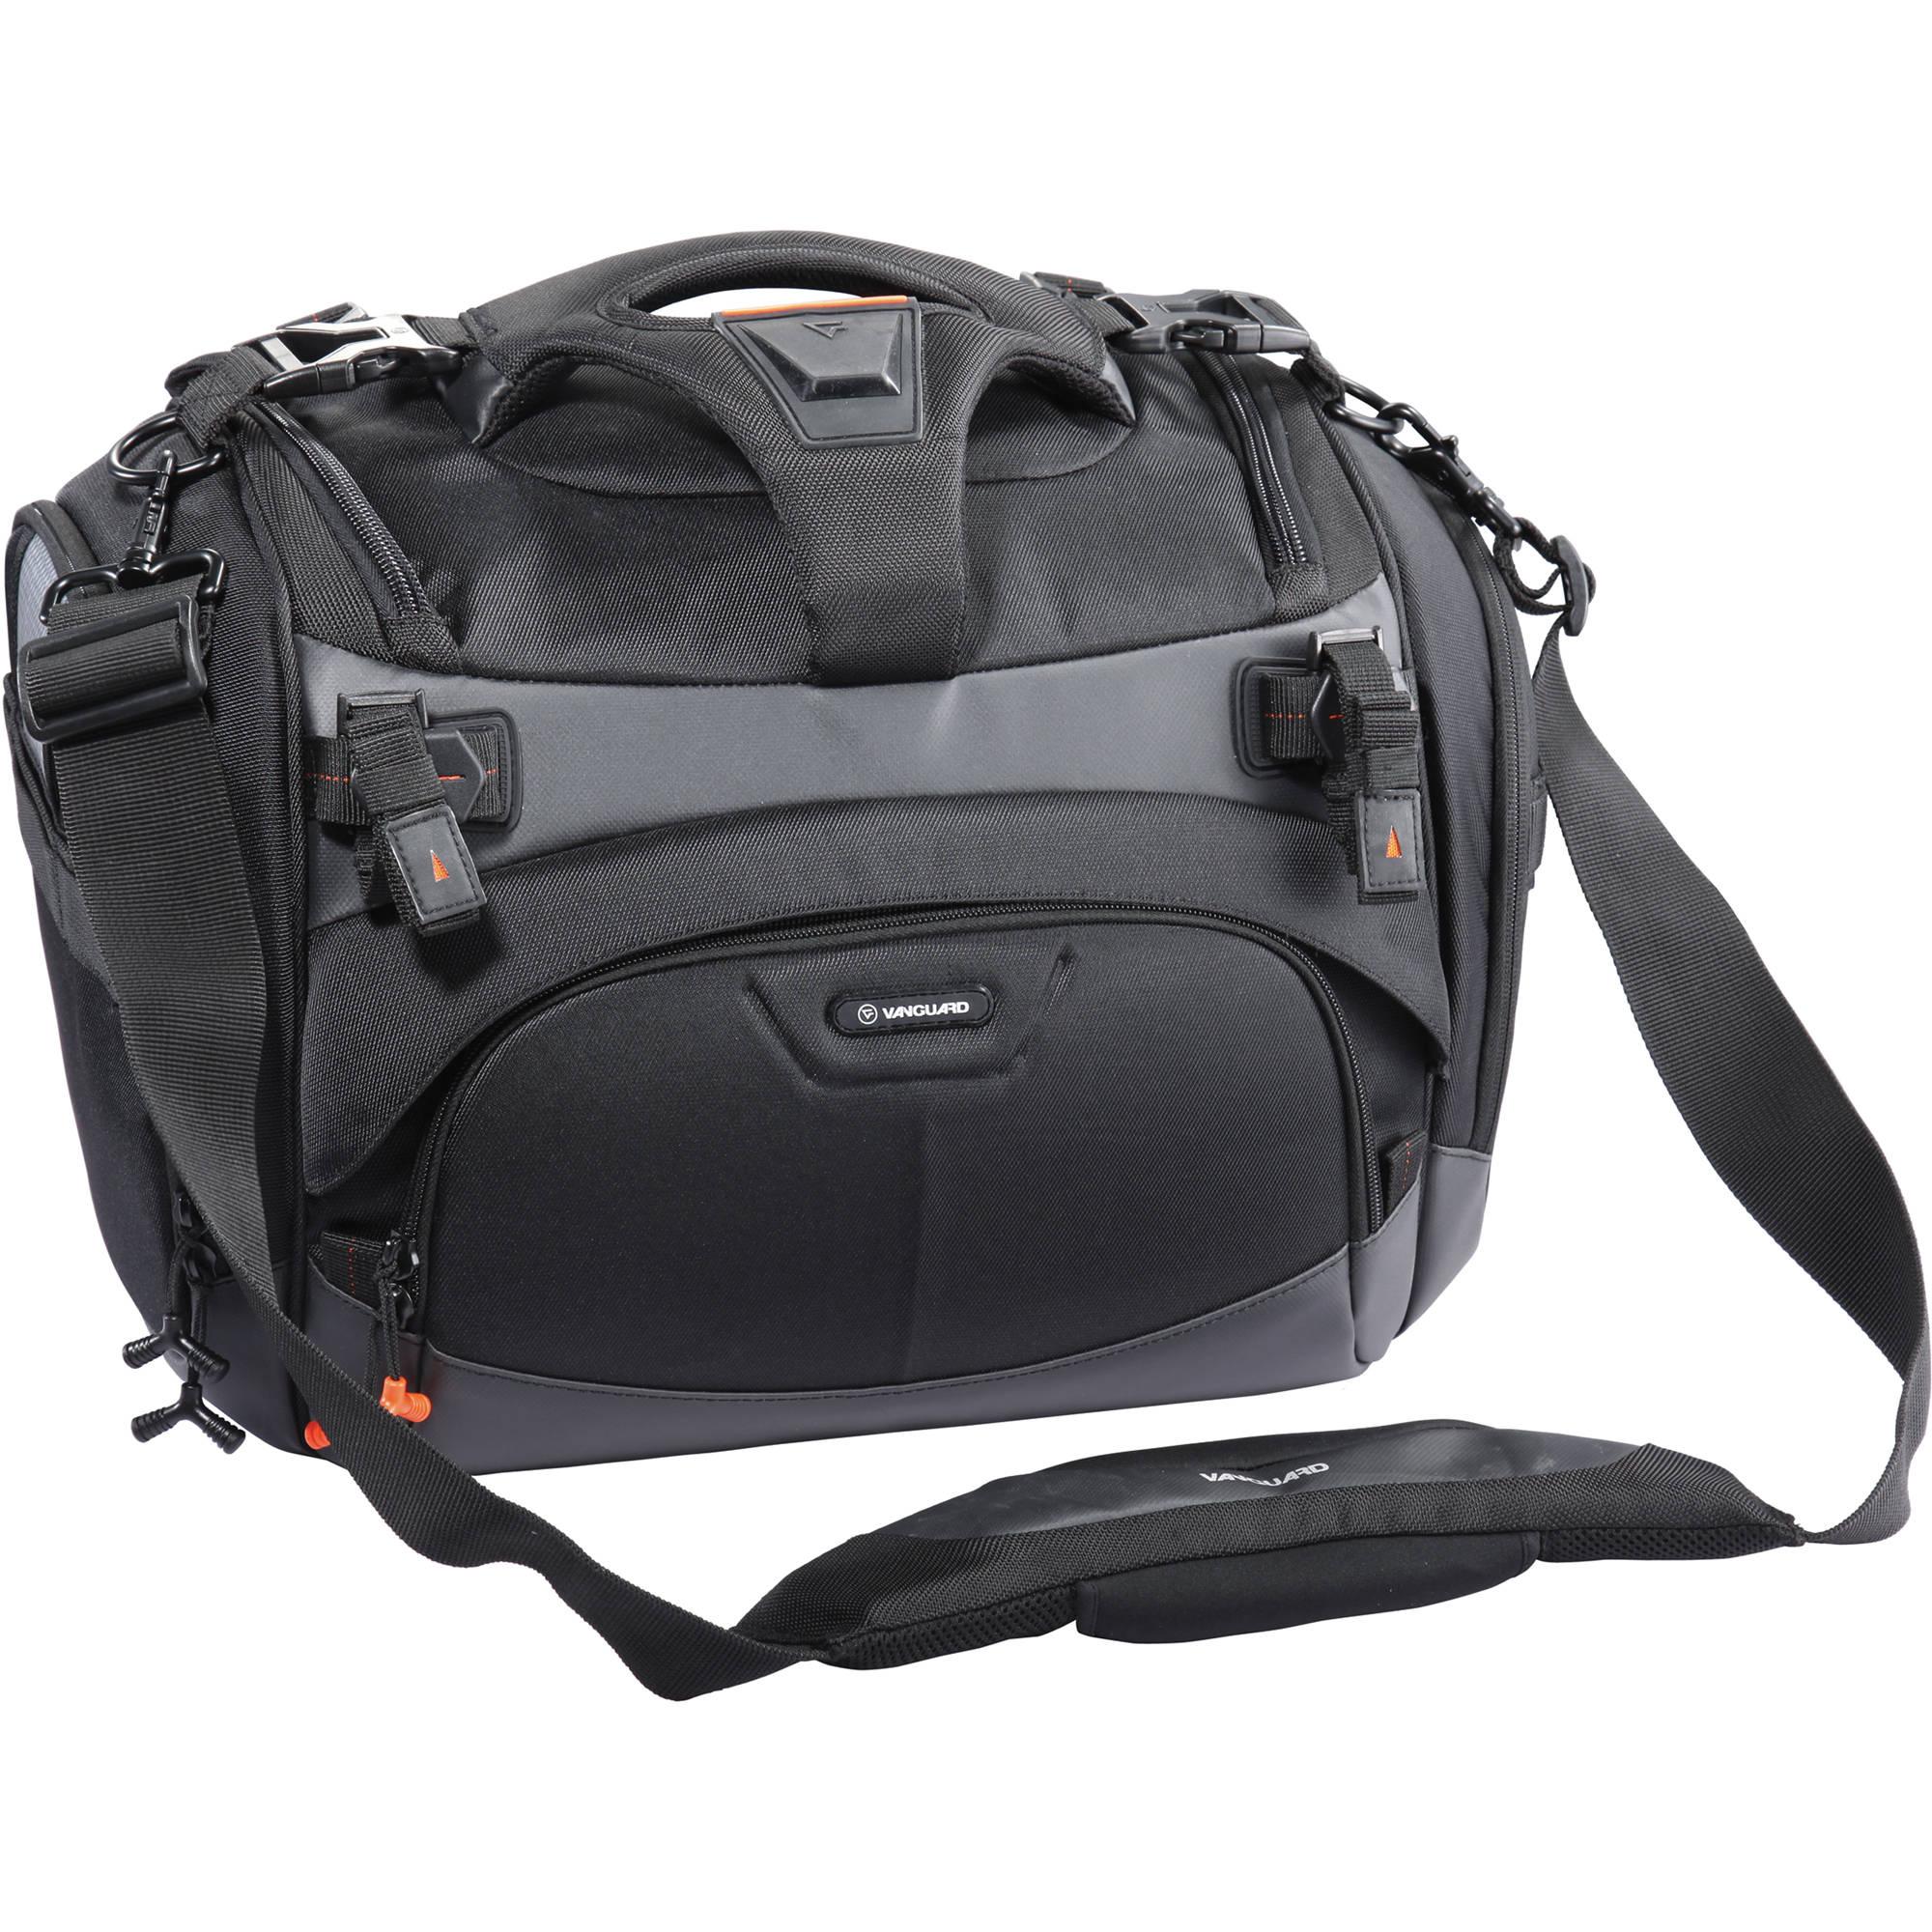 Vanguard Xcenior Series Shoulder Bag 99